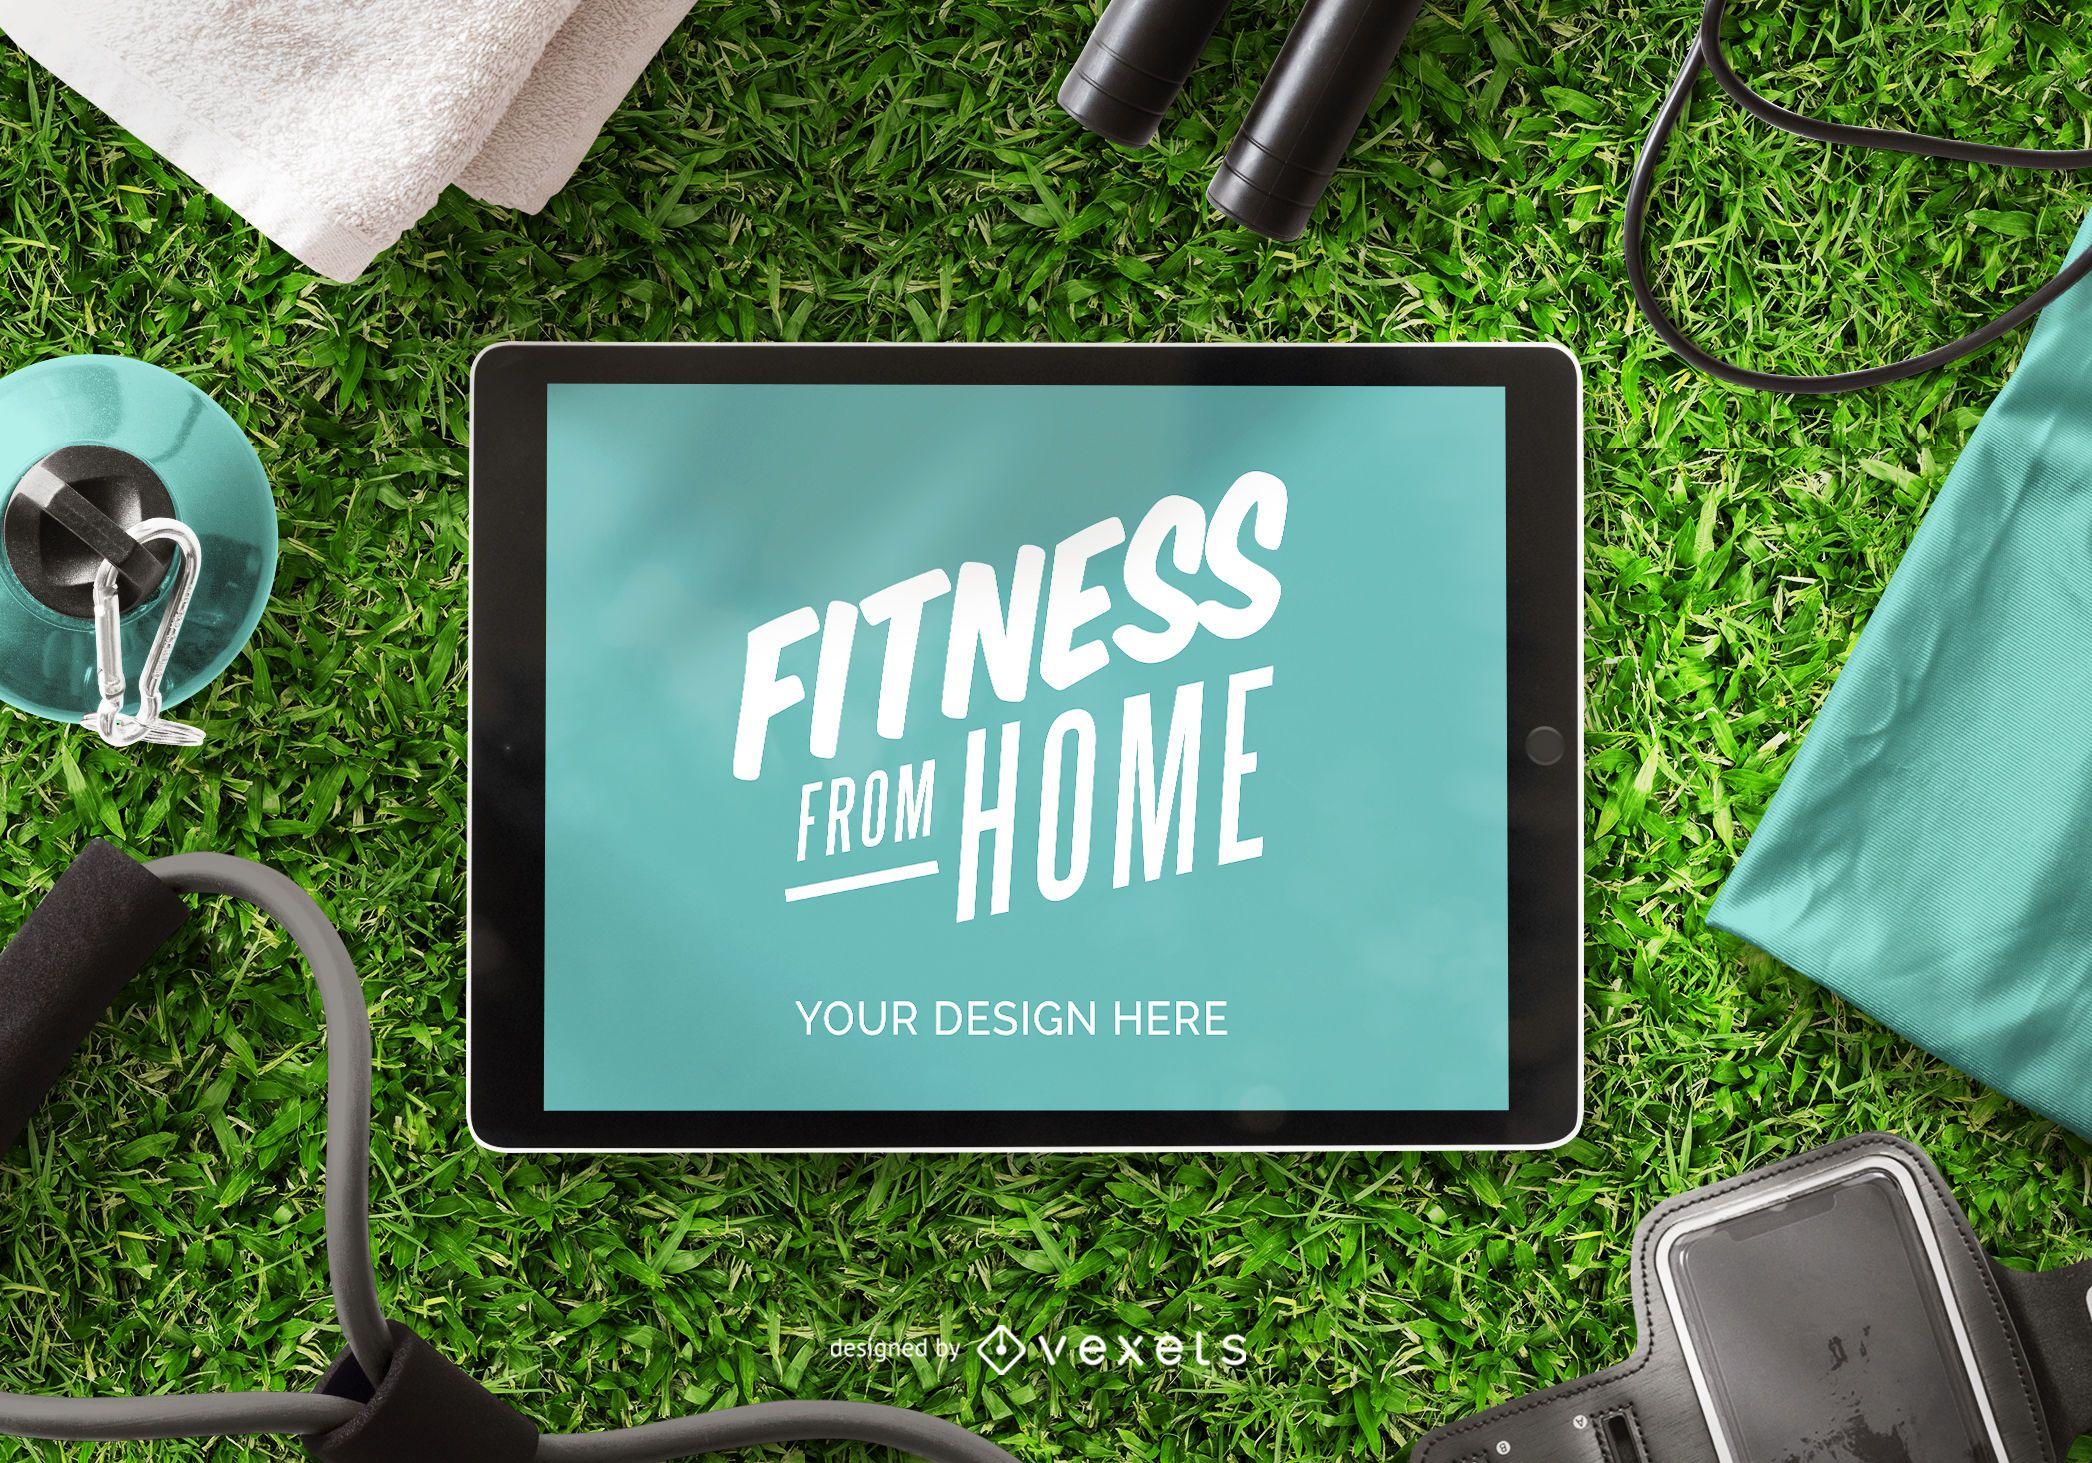 Fitness from home ipad mockup